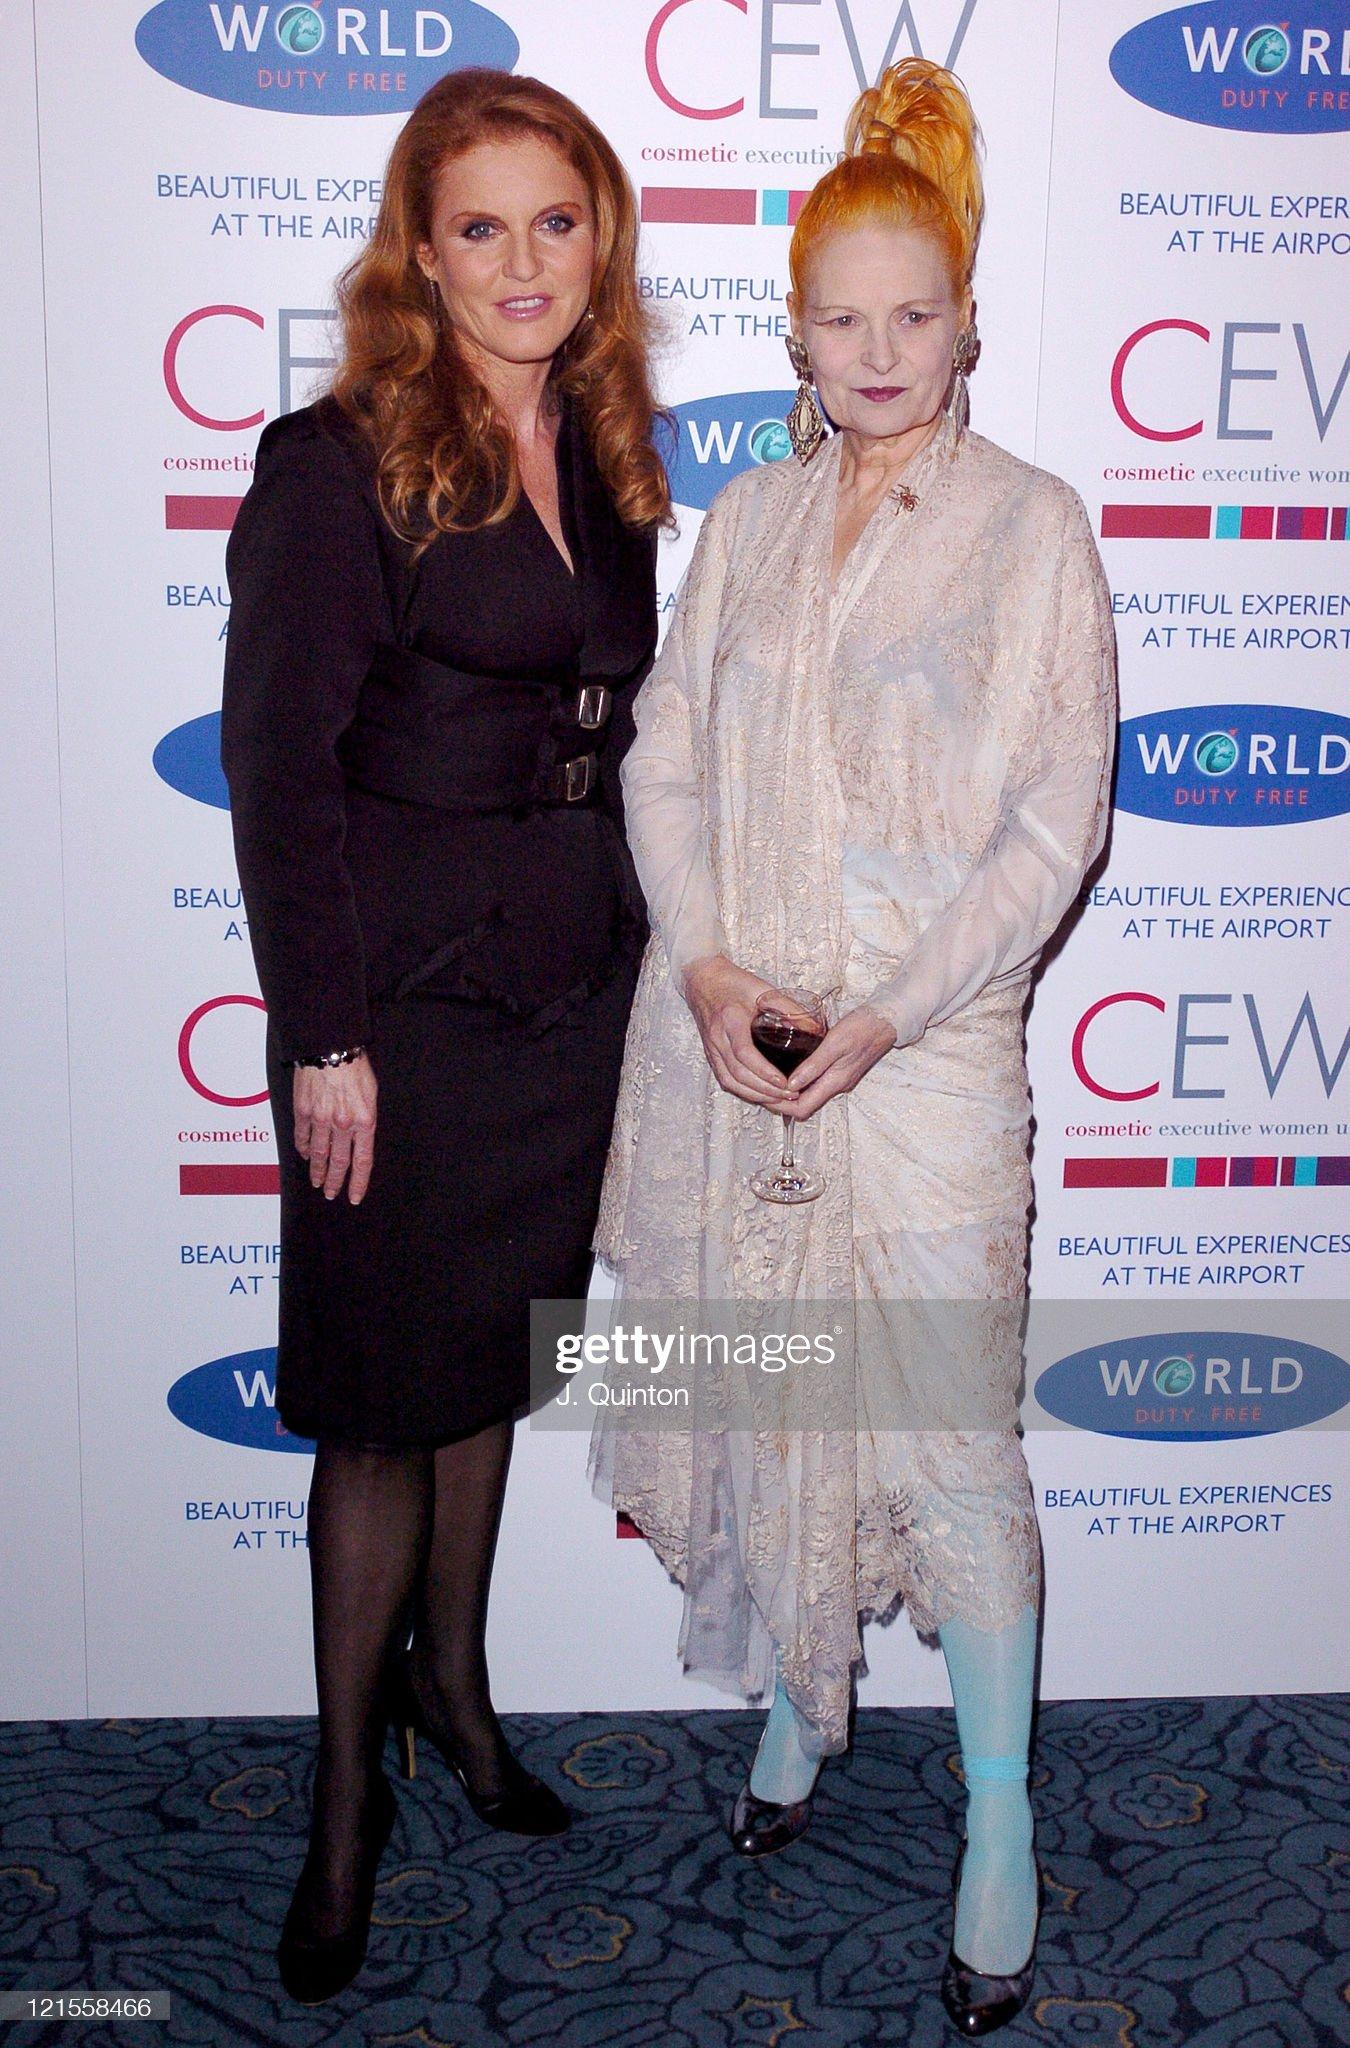 Cosmetic Executive Women Achiever Awards : News Photo